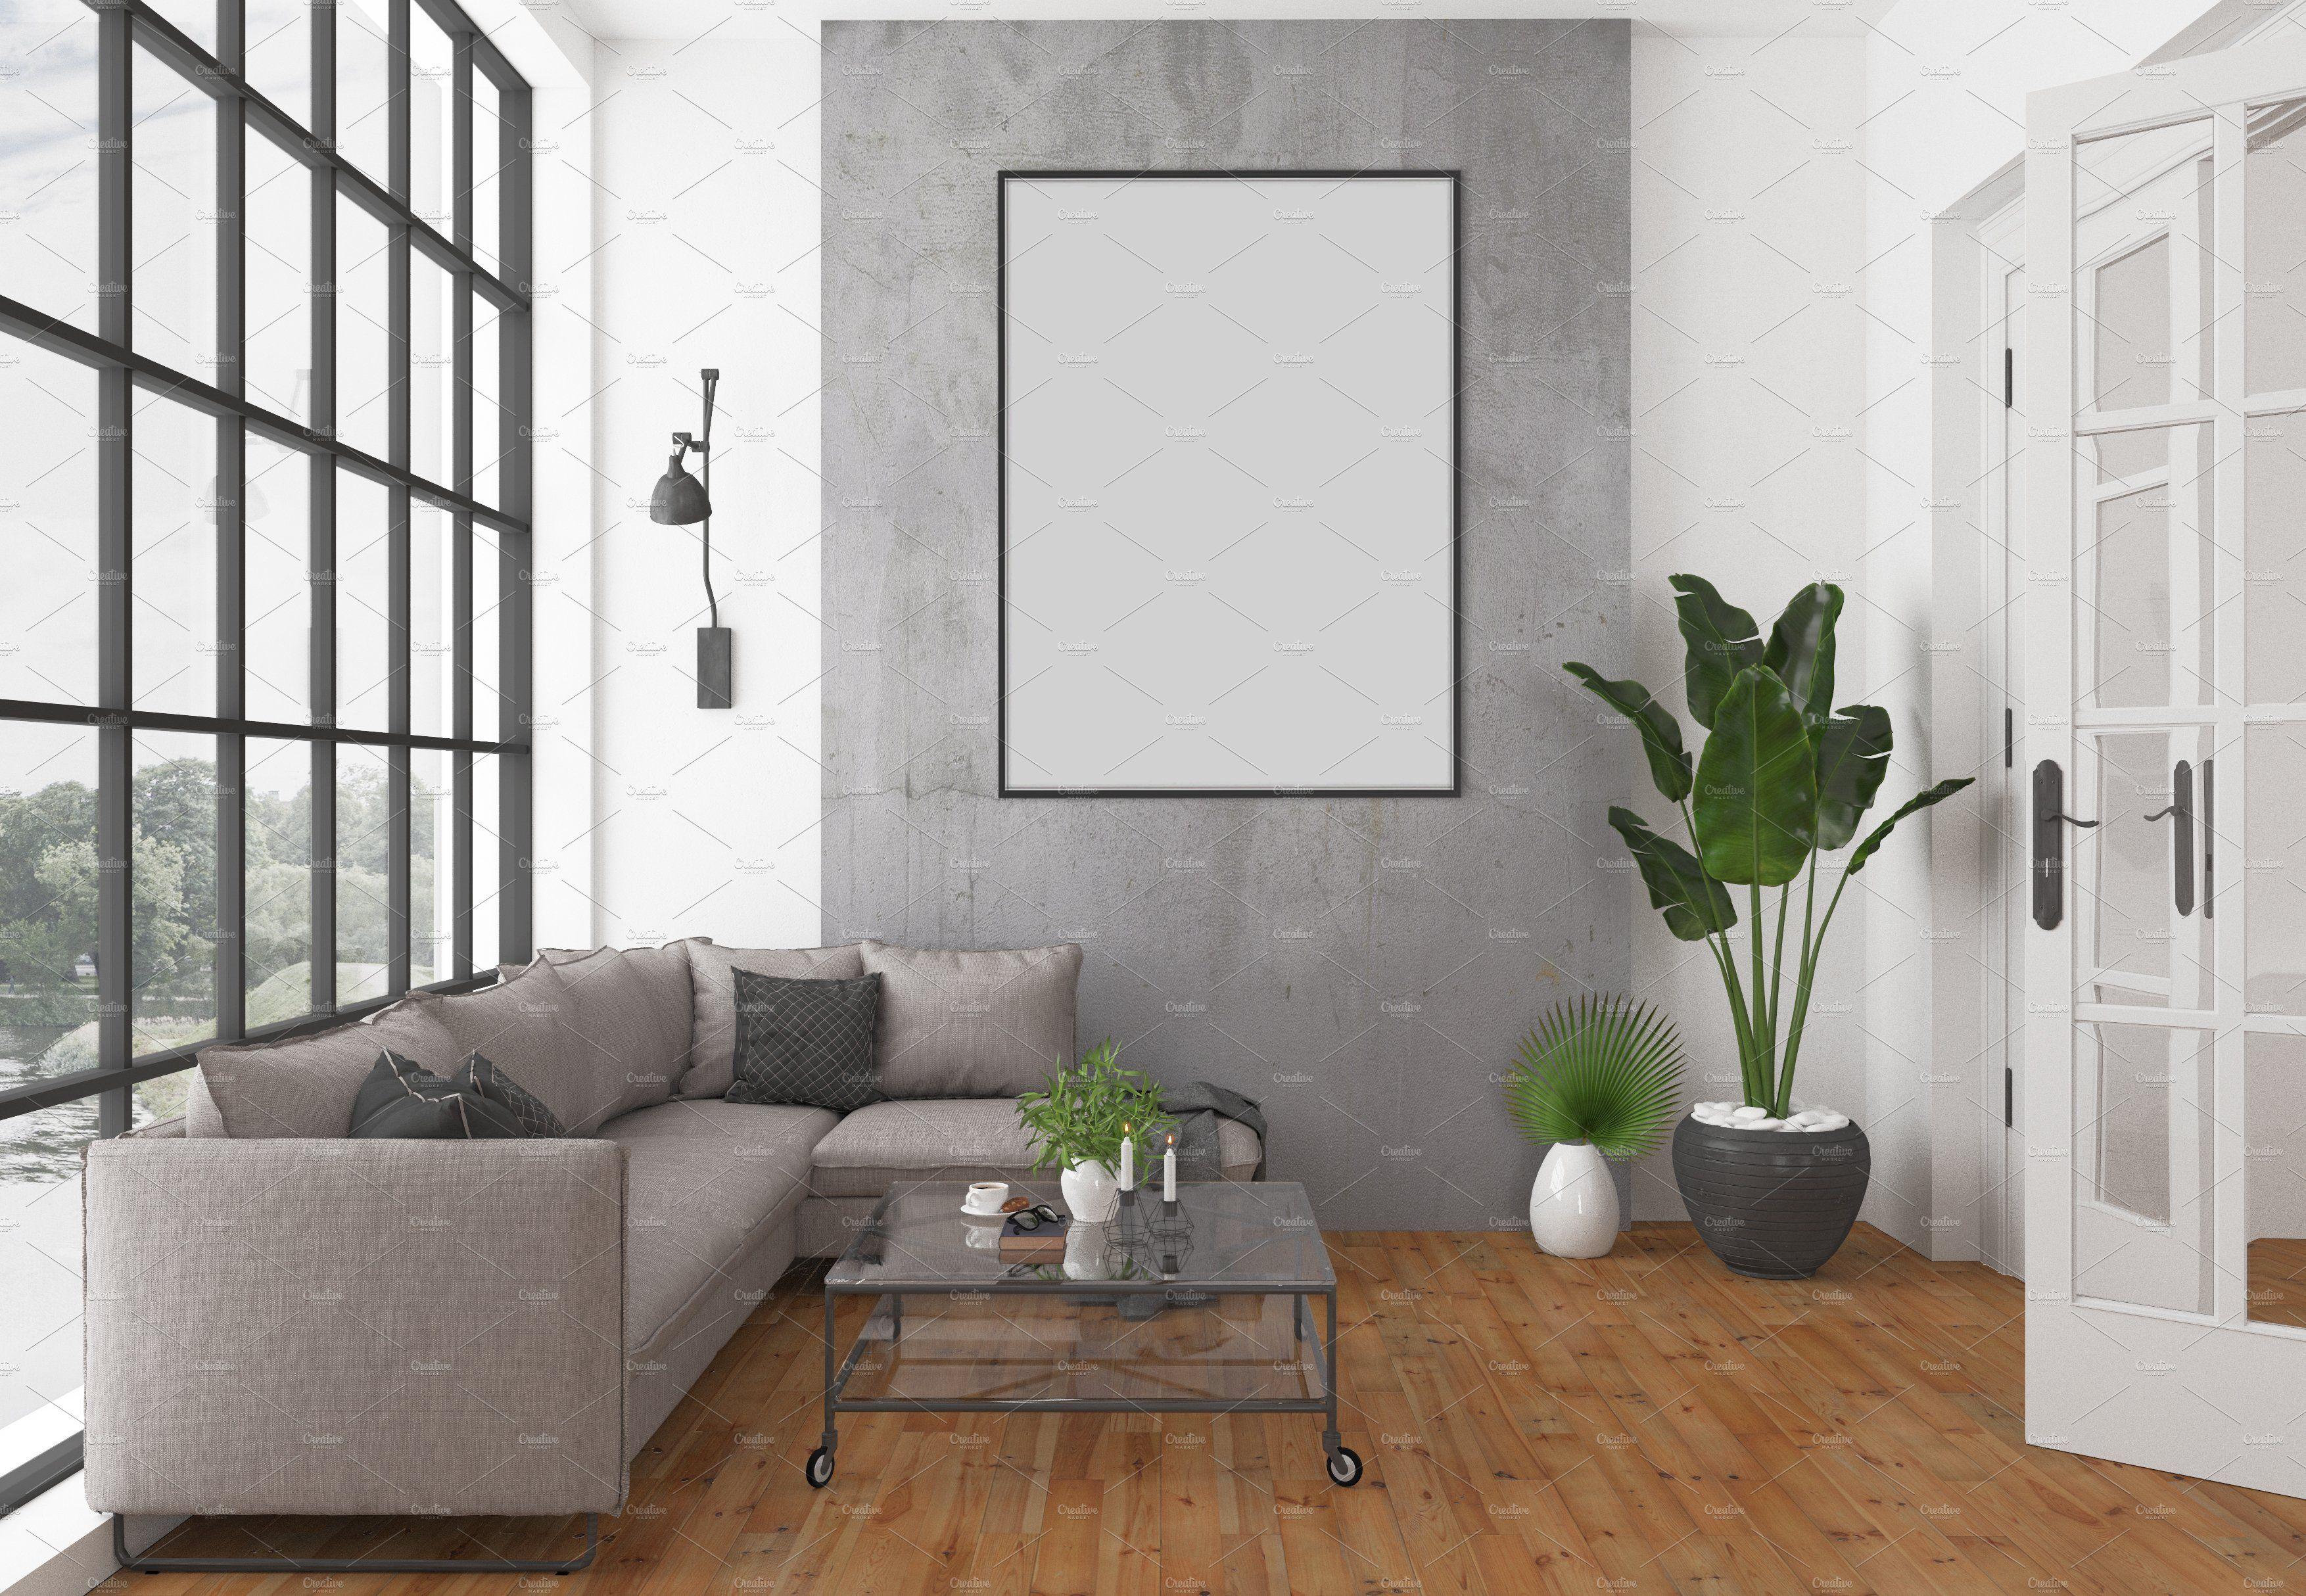 Blank Wall Mockup Black Frame Art Living Room Interior Room Poster Artwork Canvas New York City Loft Horizontal Vertical Frame Bundle